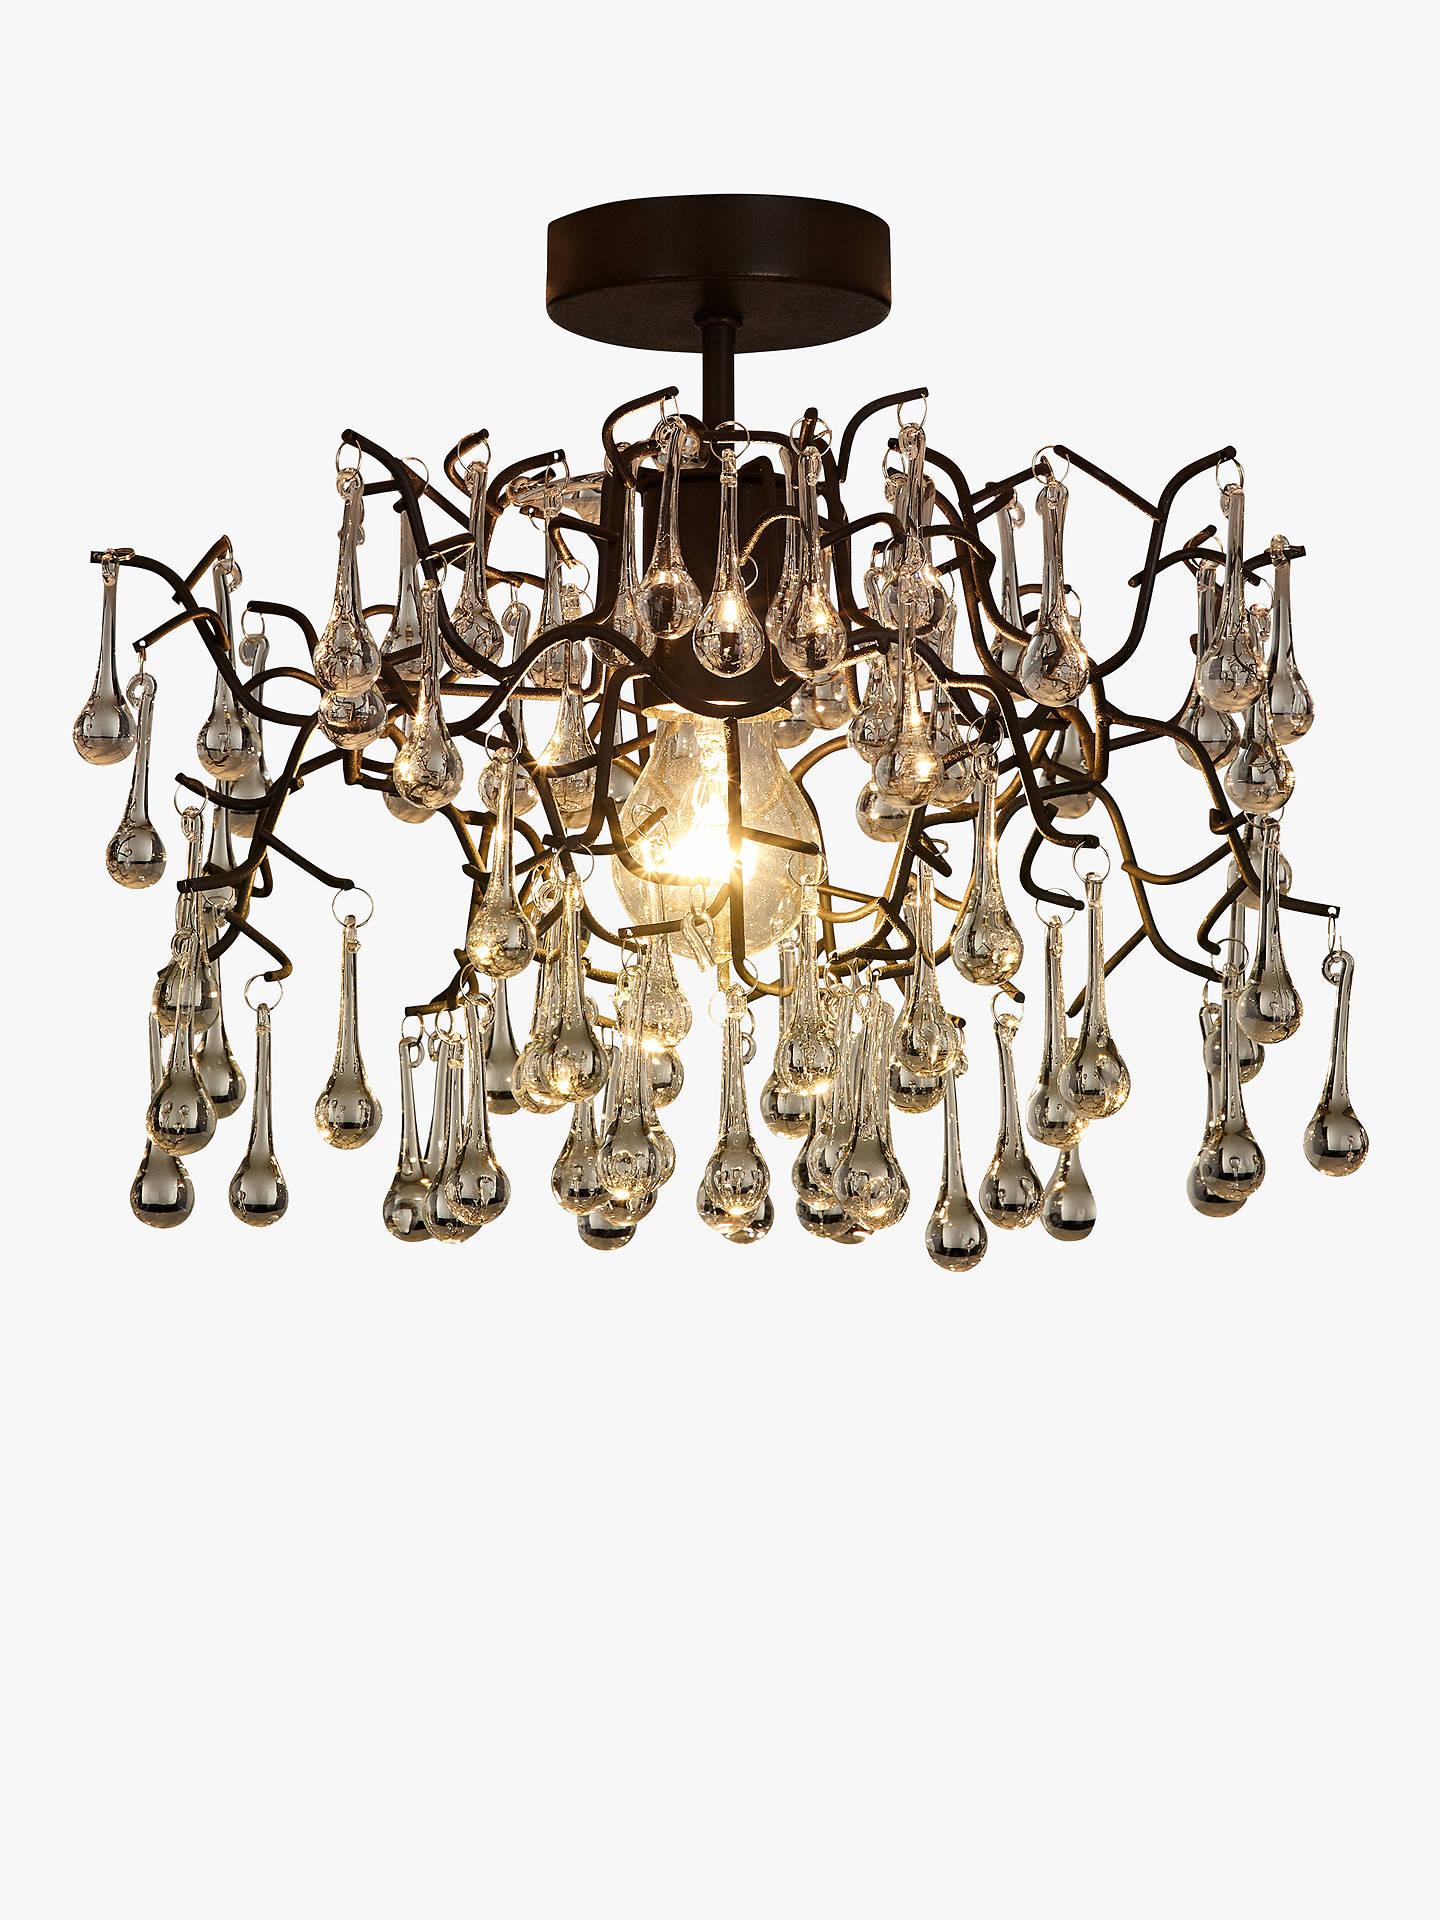 Buy john lewis partners victoria semi flush ceiling light brown online at johnlewis